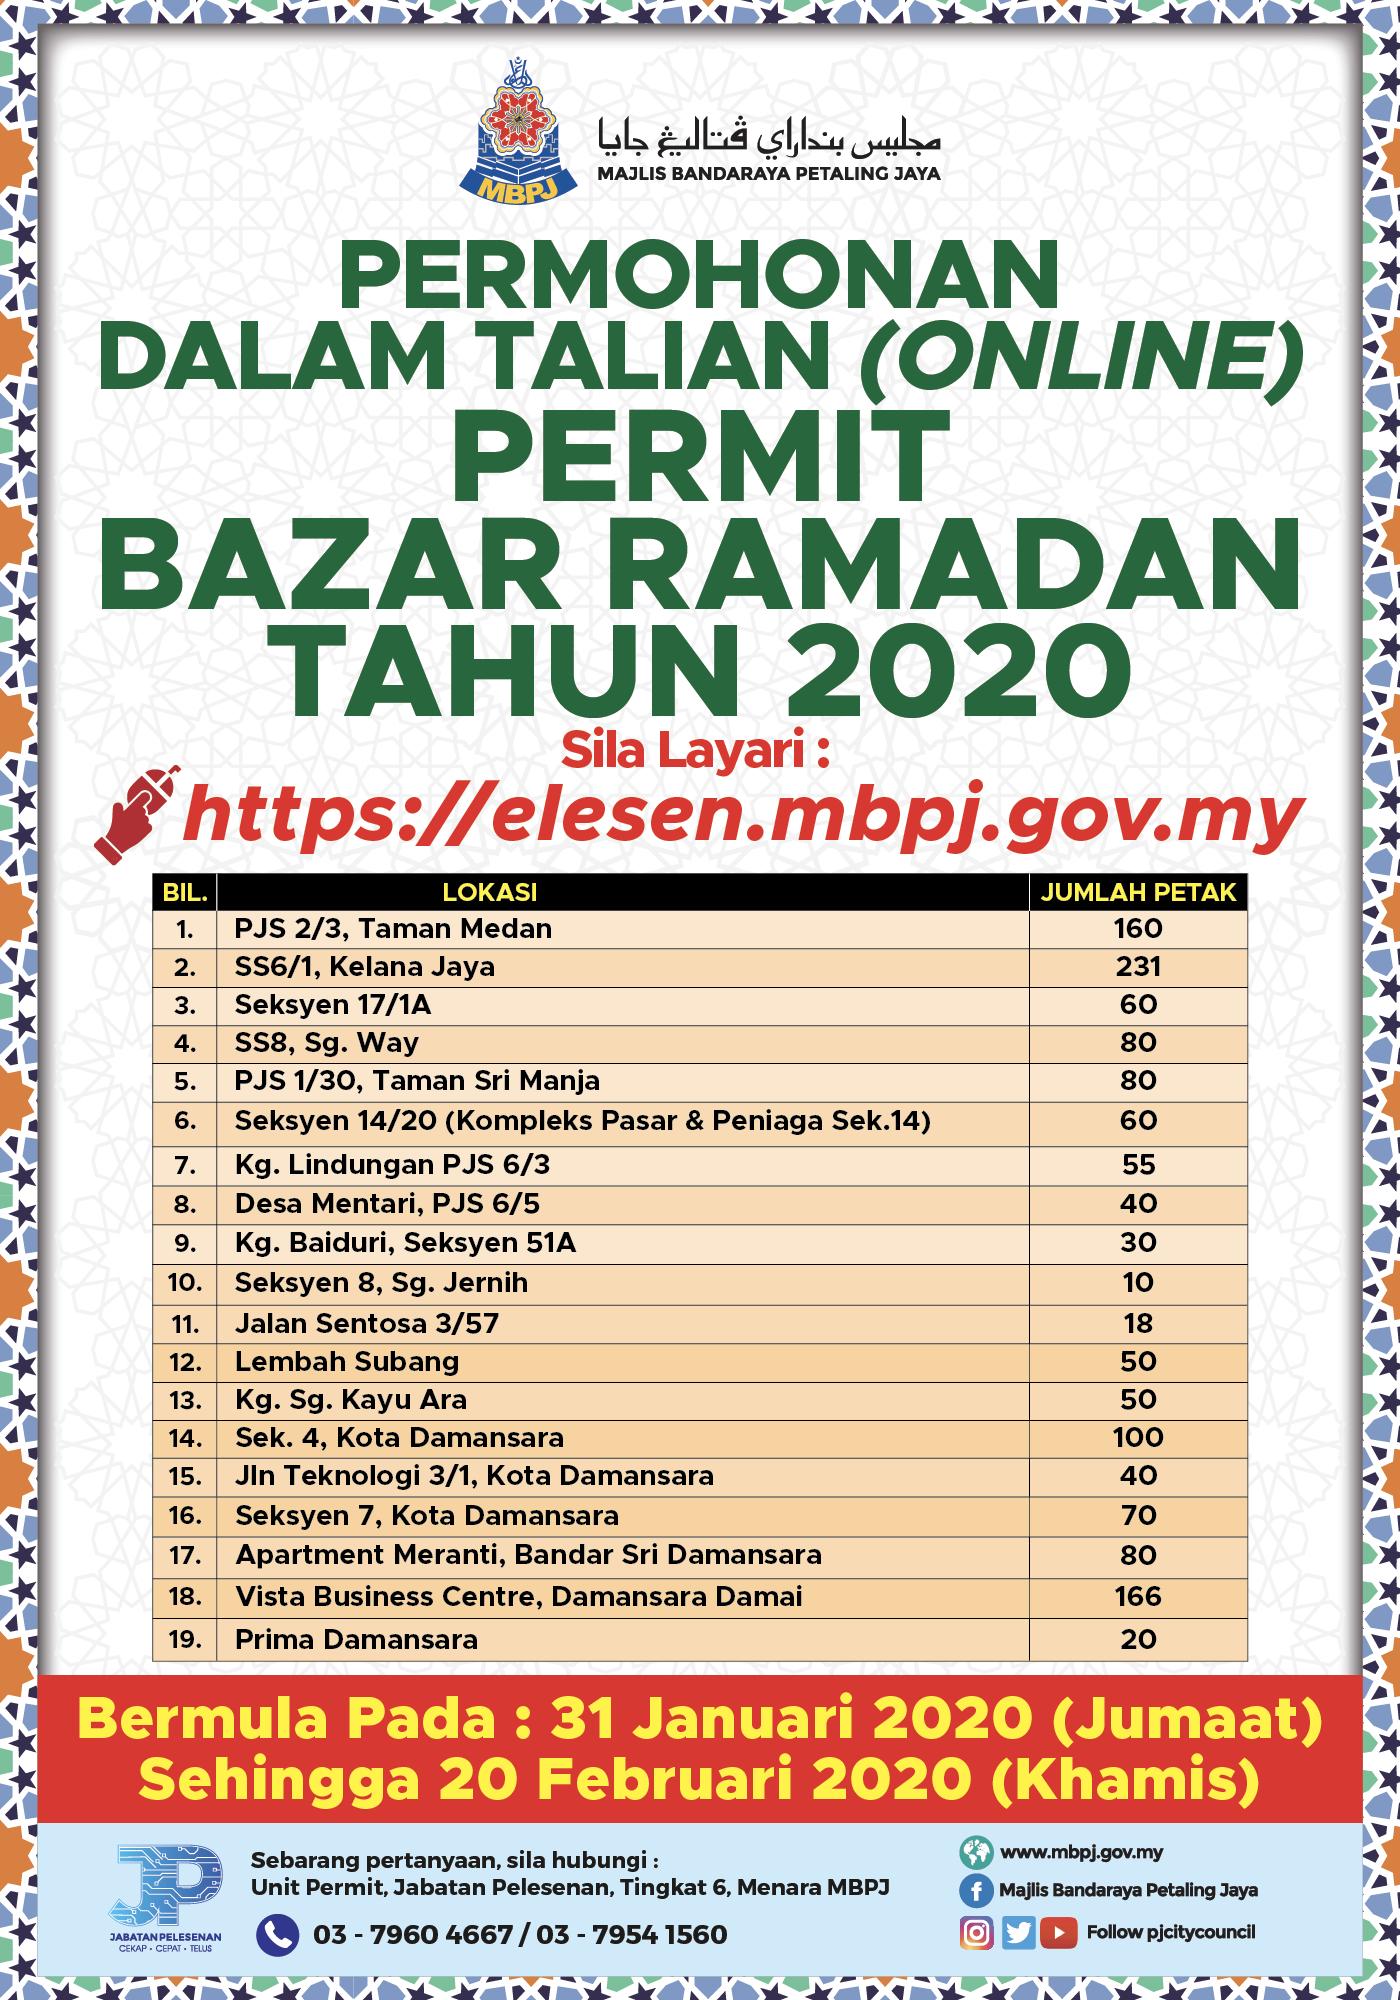 Permit Bazaar Ramadan 2020